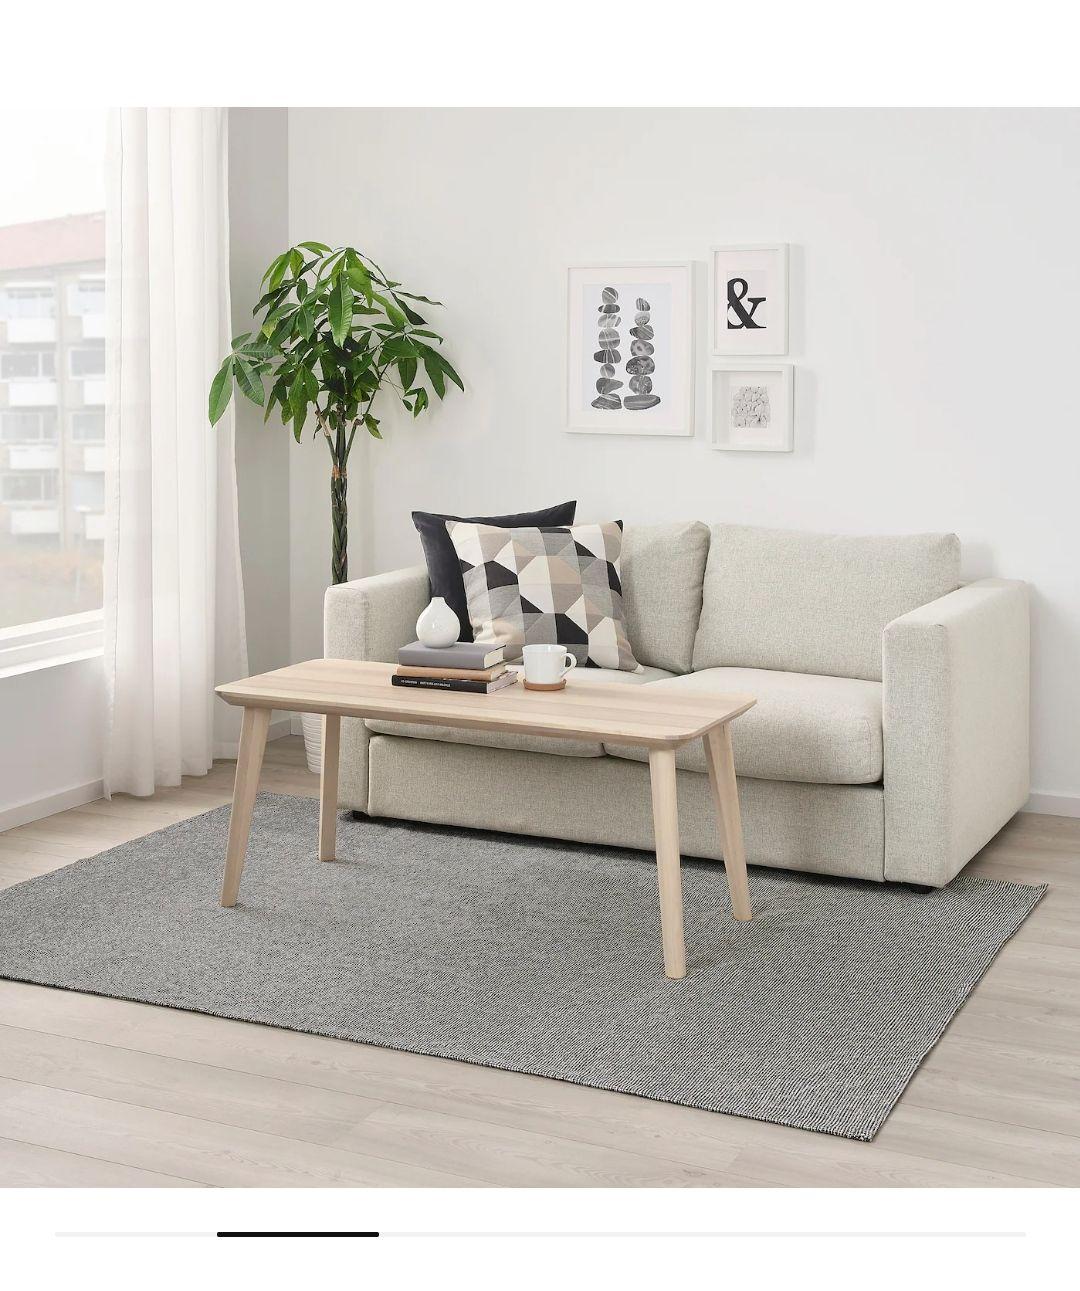 IKEA: Tapete natural/hueso 120x180 cm de $999 a $299